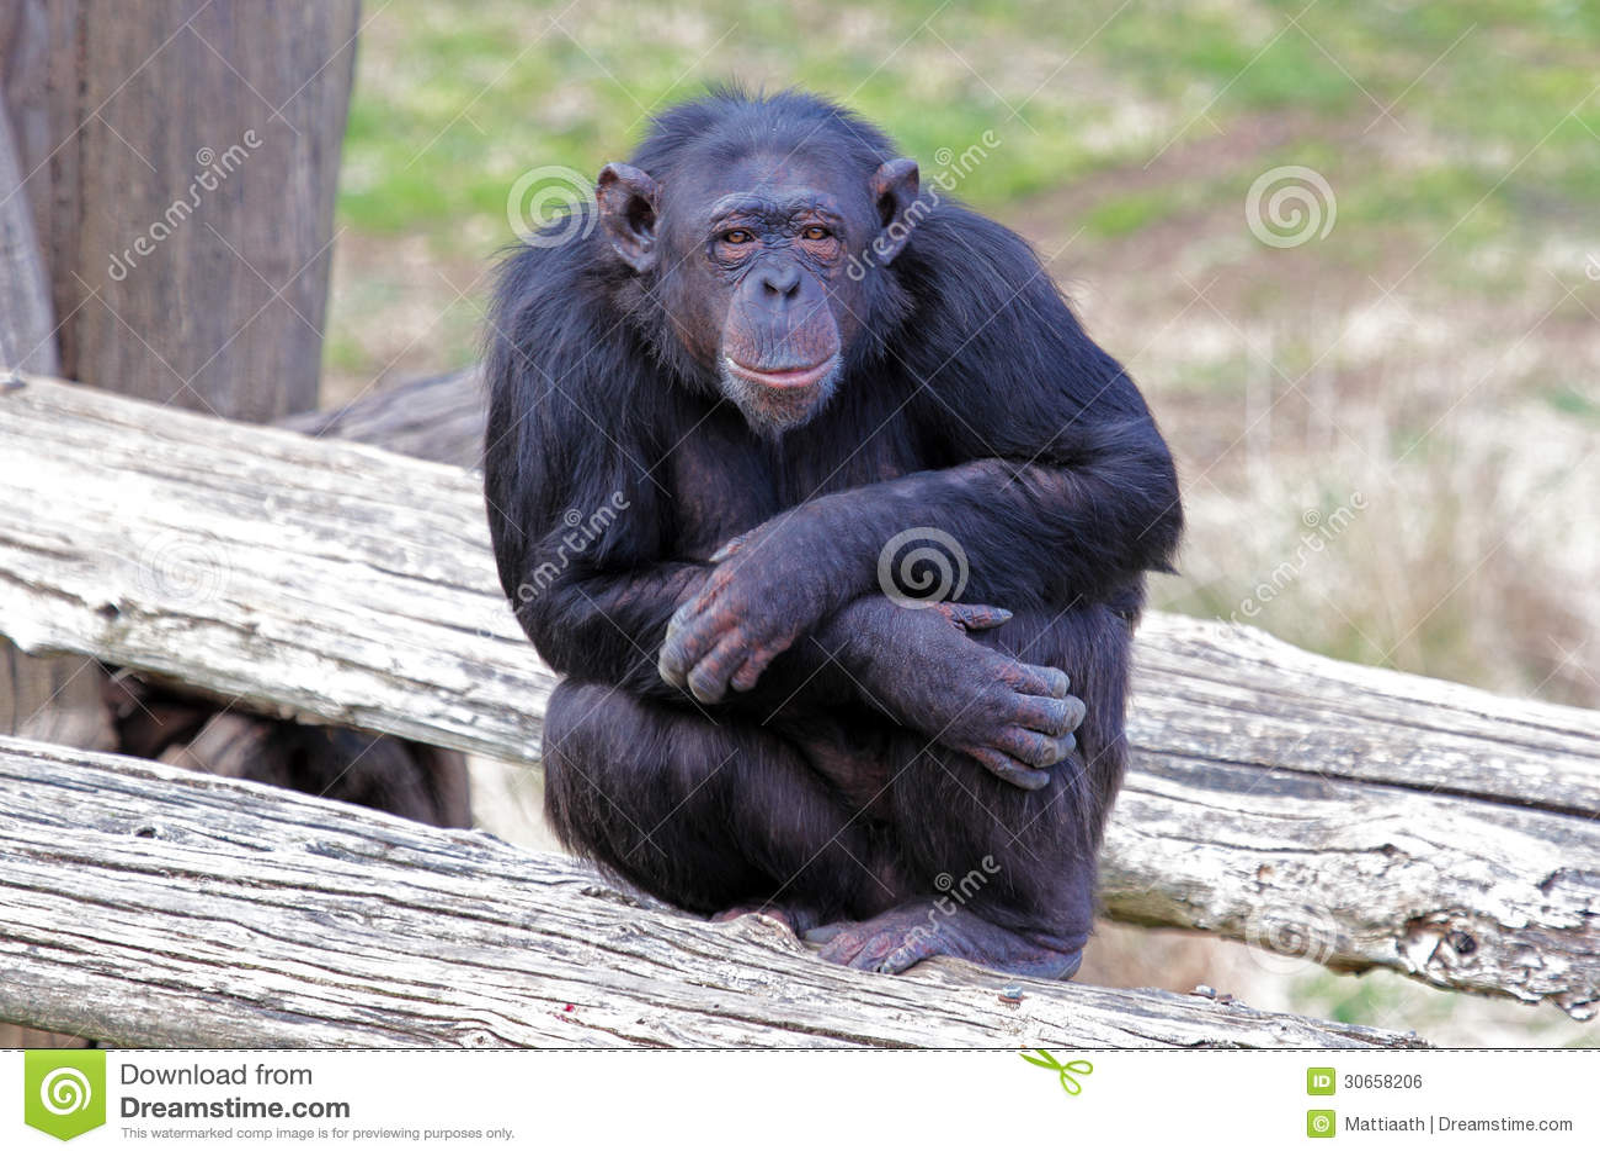 Silhouette Sitting Chimp Front Stock Vector - Illustration ...  |Chimp Sitting